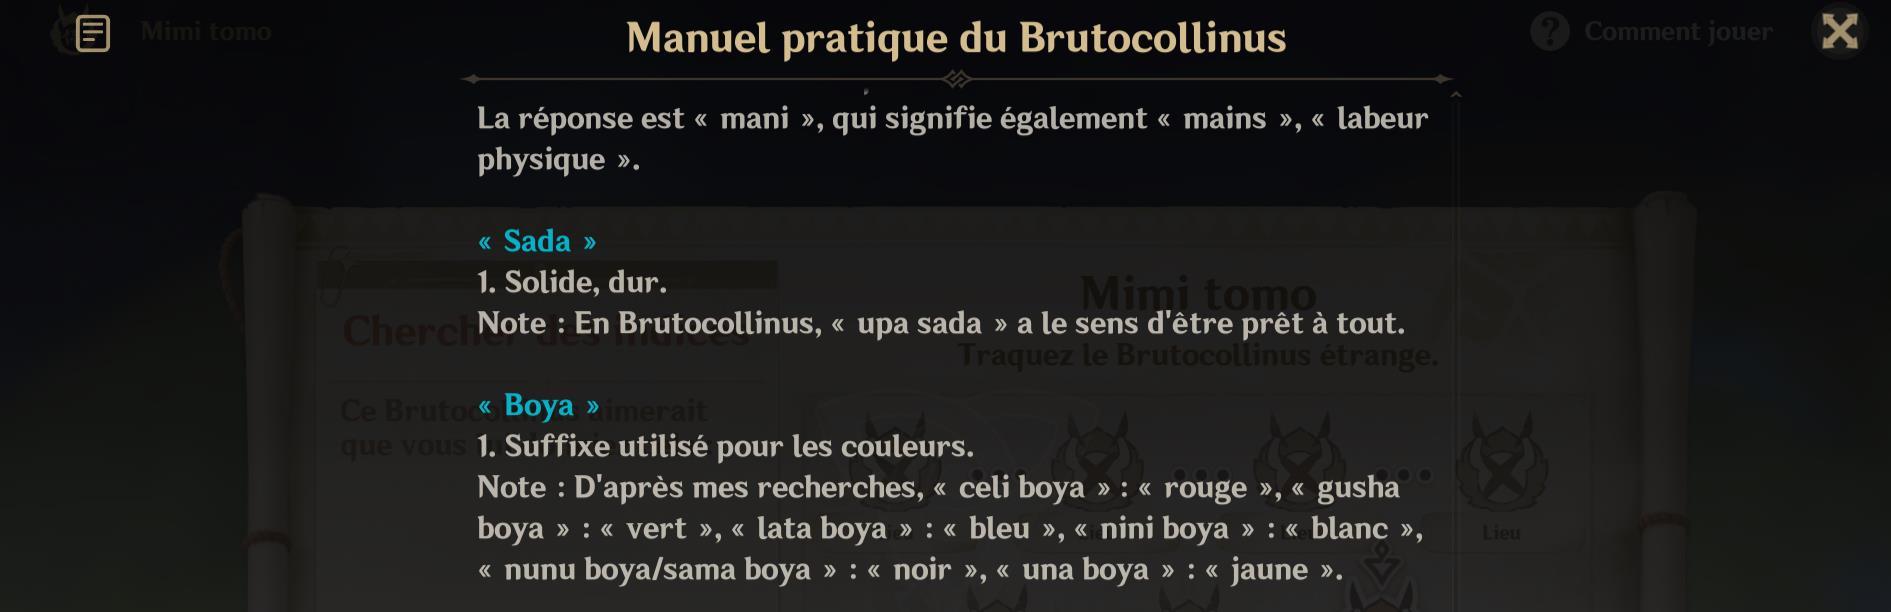 traduction-unu-boya